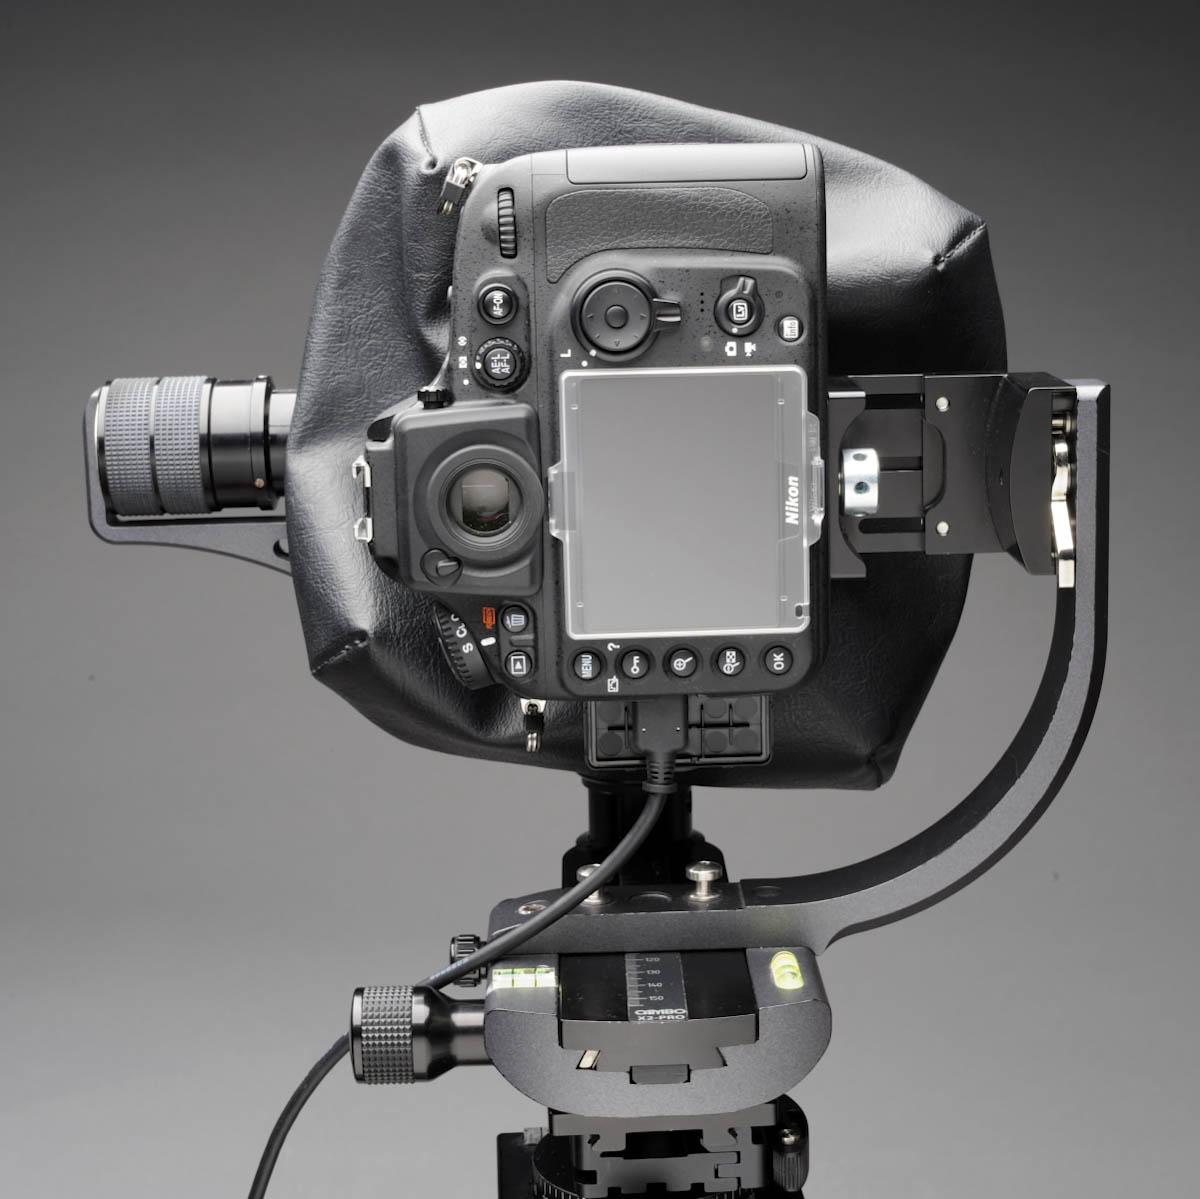 Nikon-D800-Cambo-X2-Pro-Schneider-Kreuznach-APO-90mm-f4.5-15